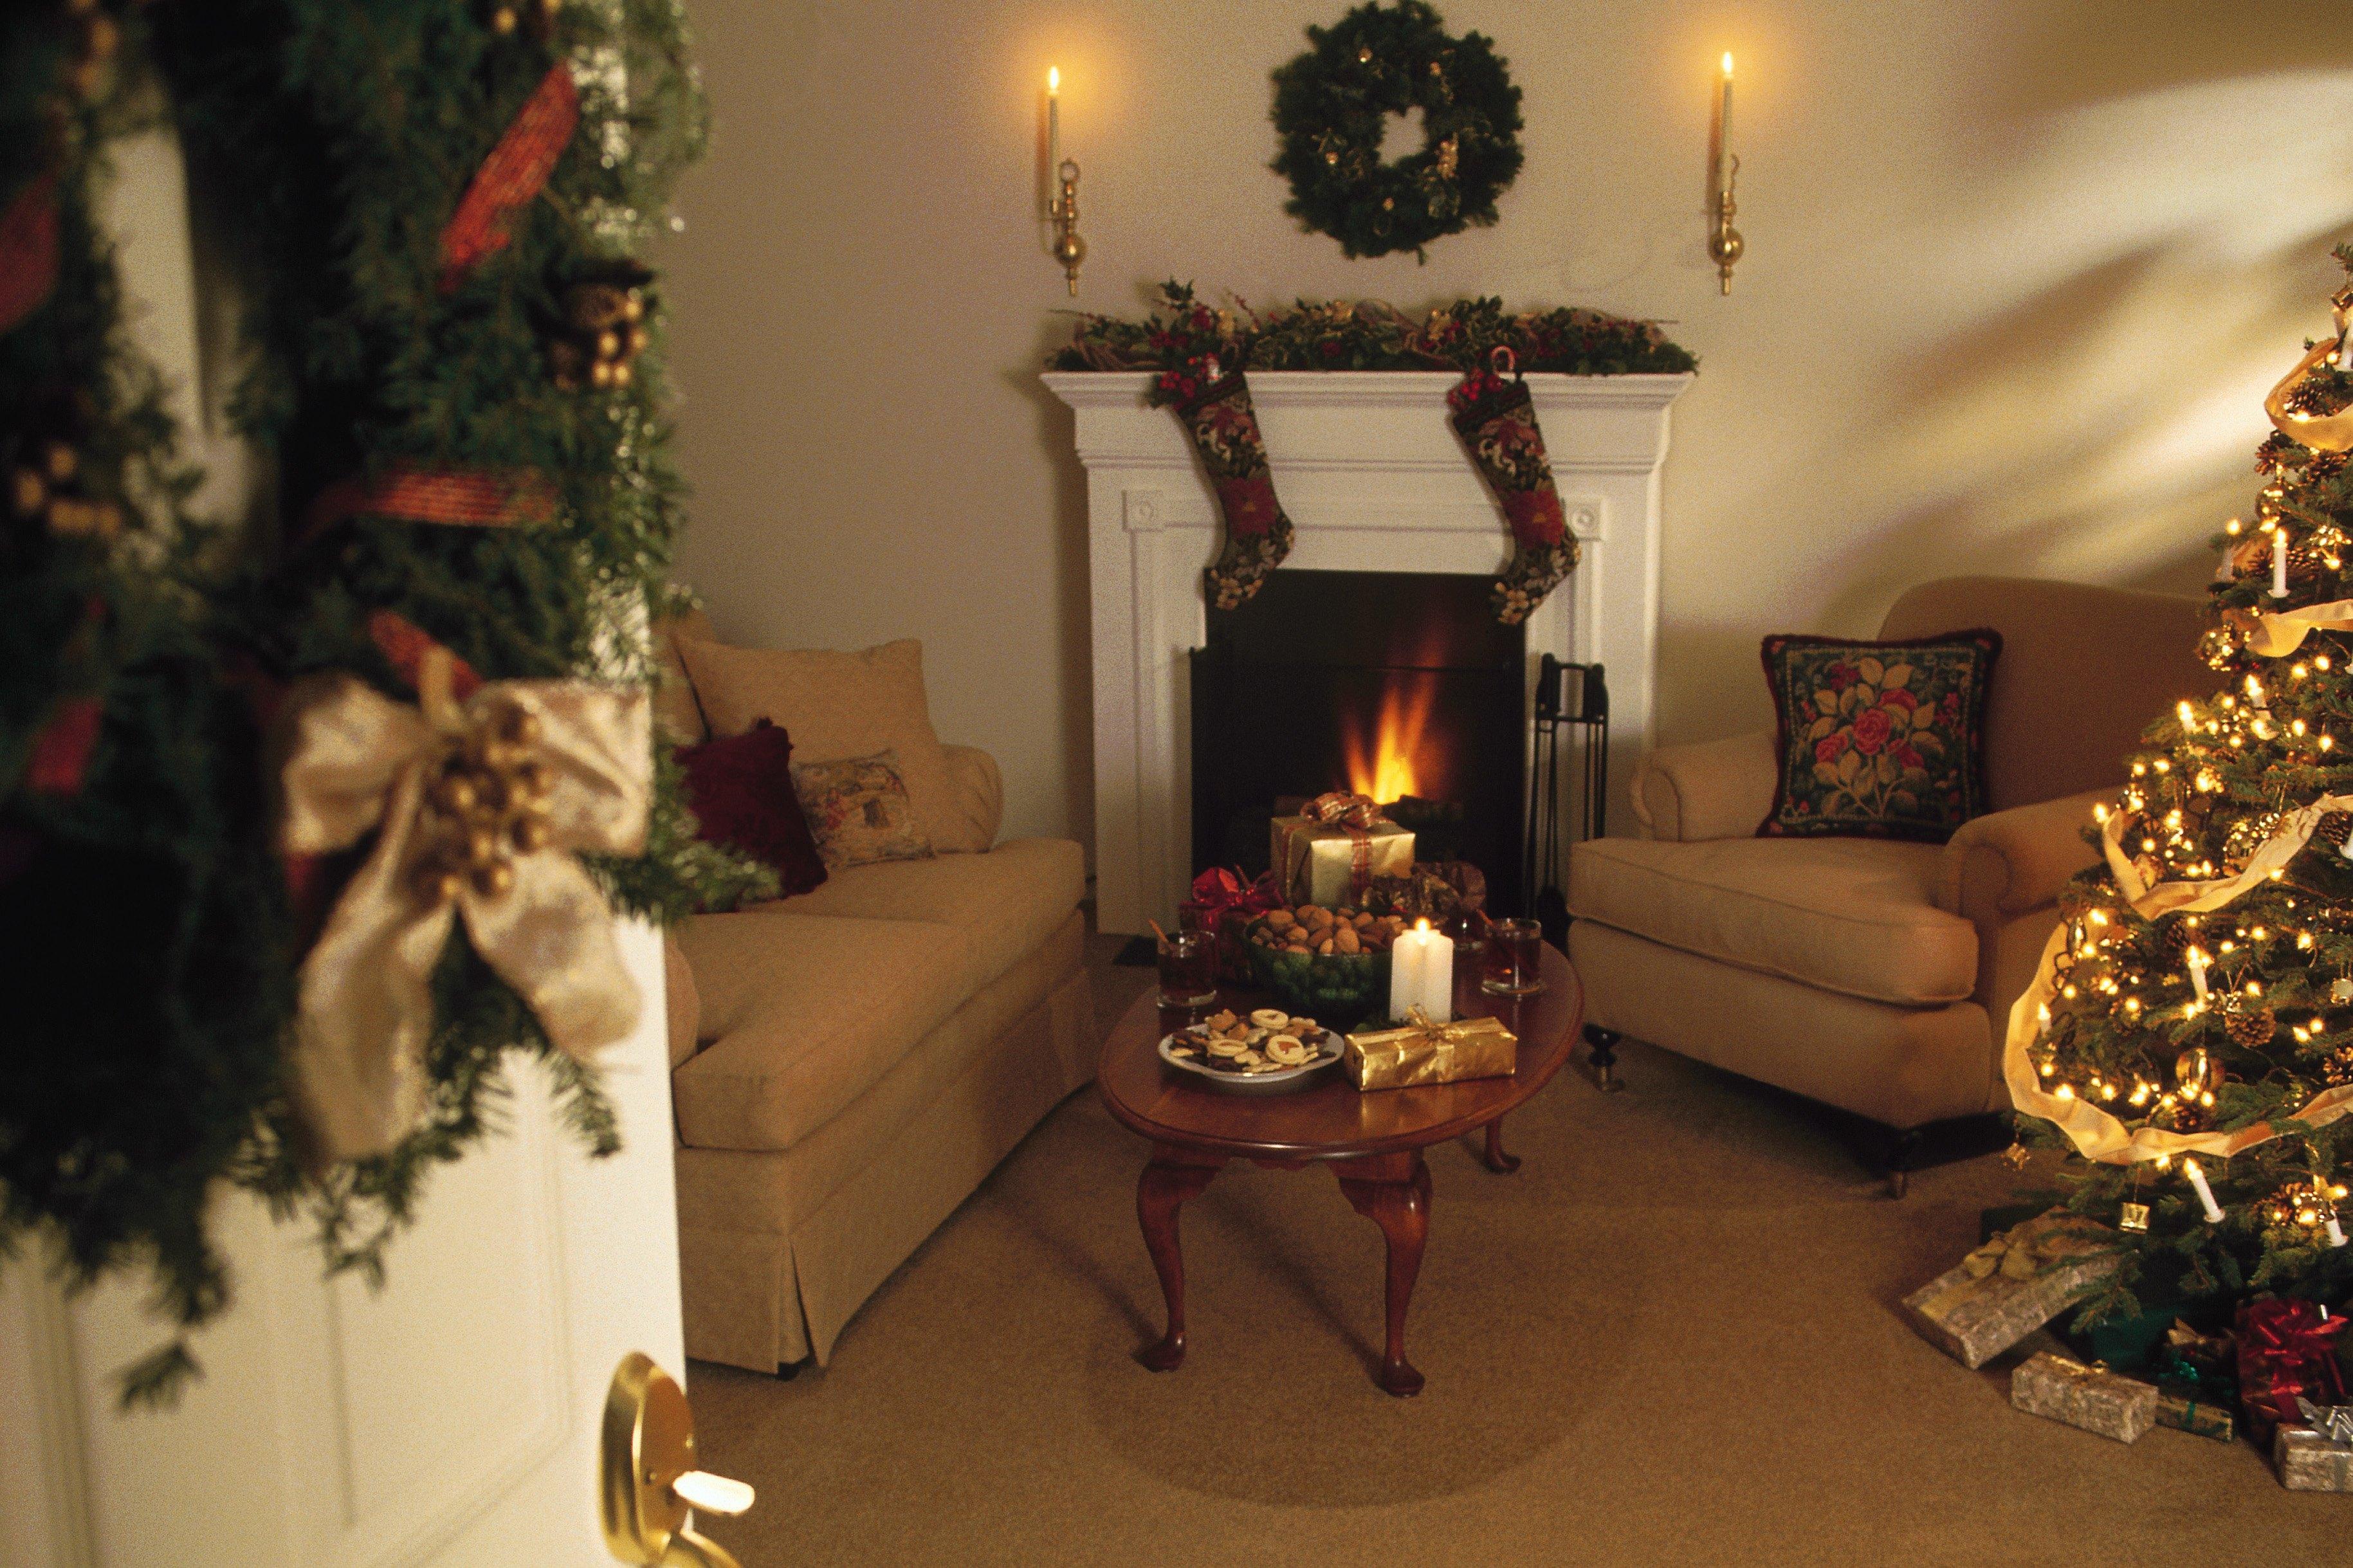 How To Build Fireplace Doors Ehow